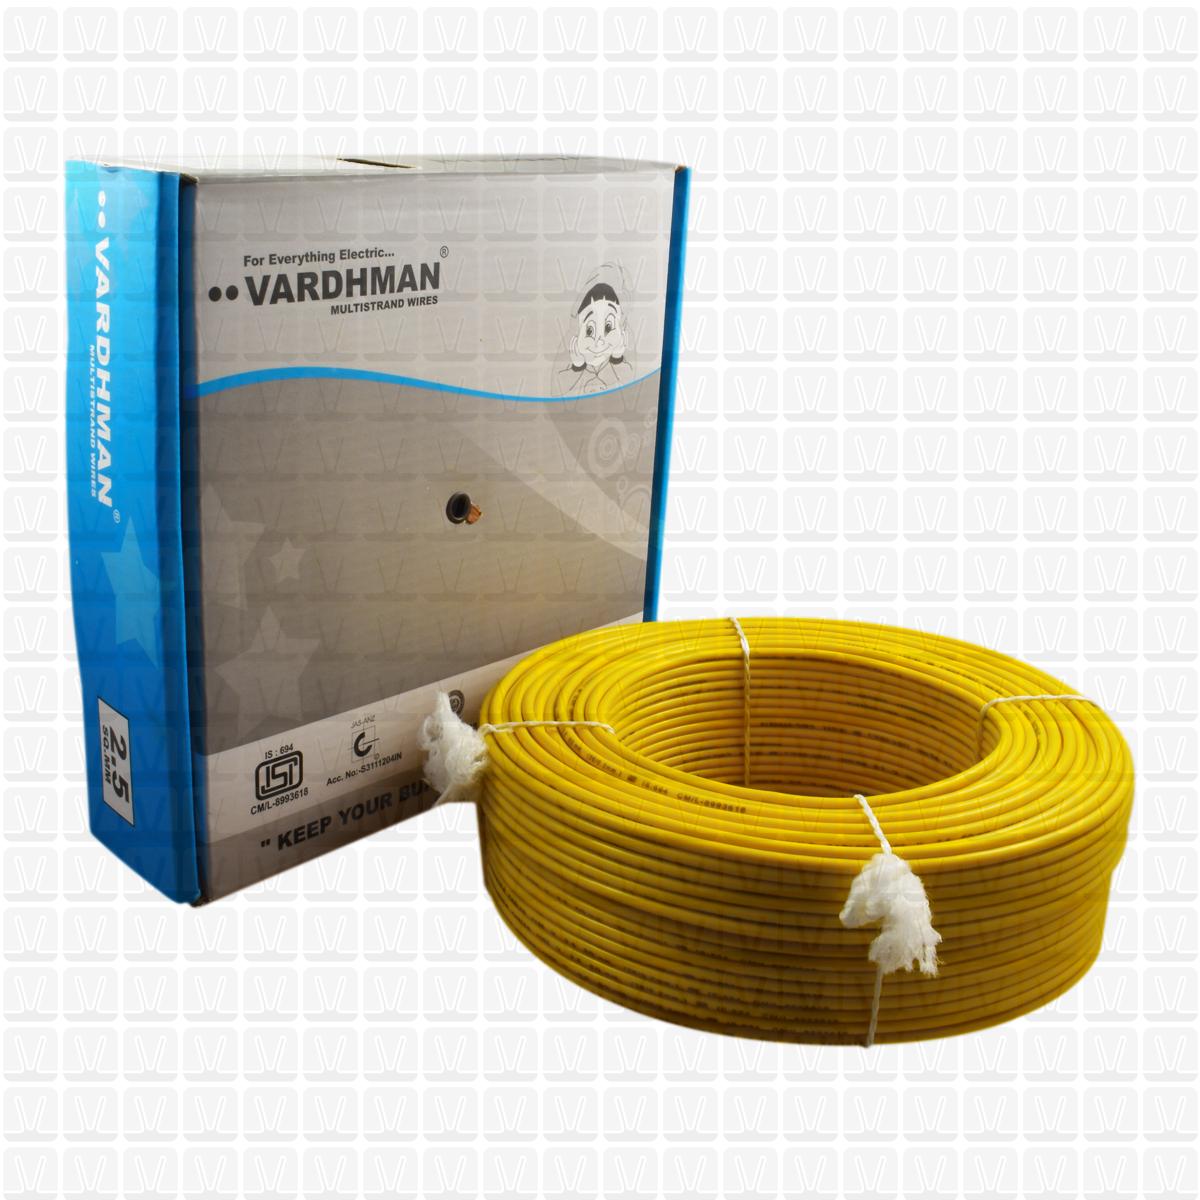 vardhman 2 5 mm wire yellow (90 mtr /bundle)   multistrand wire   vardhman  shop